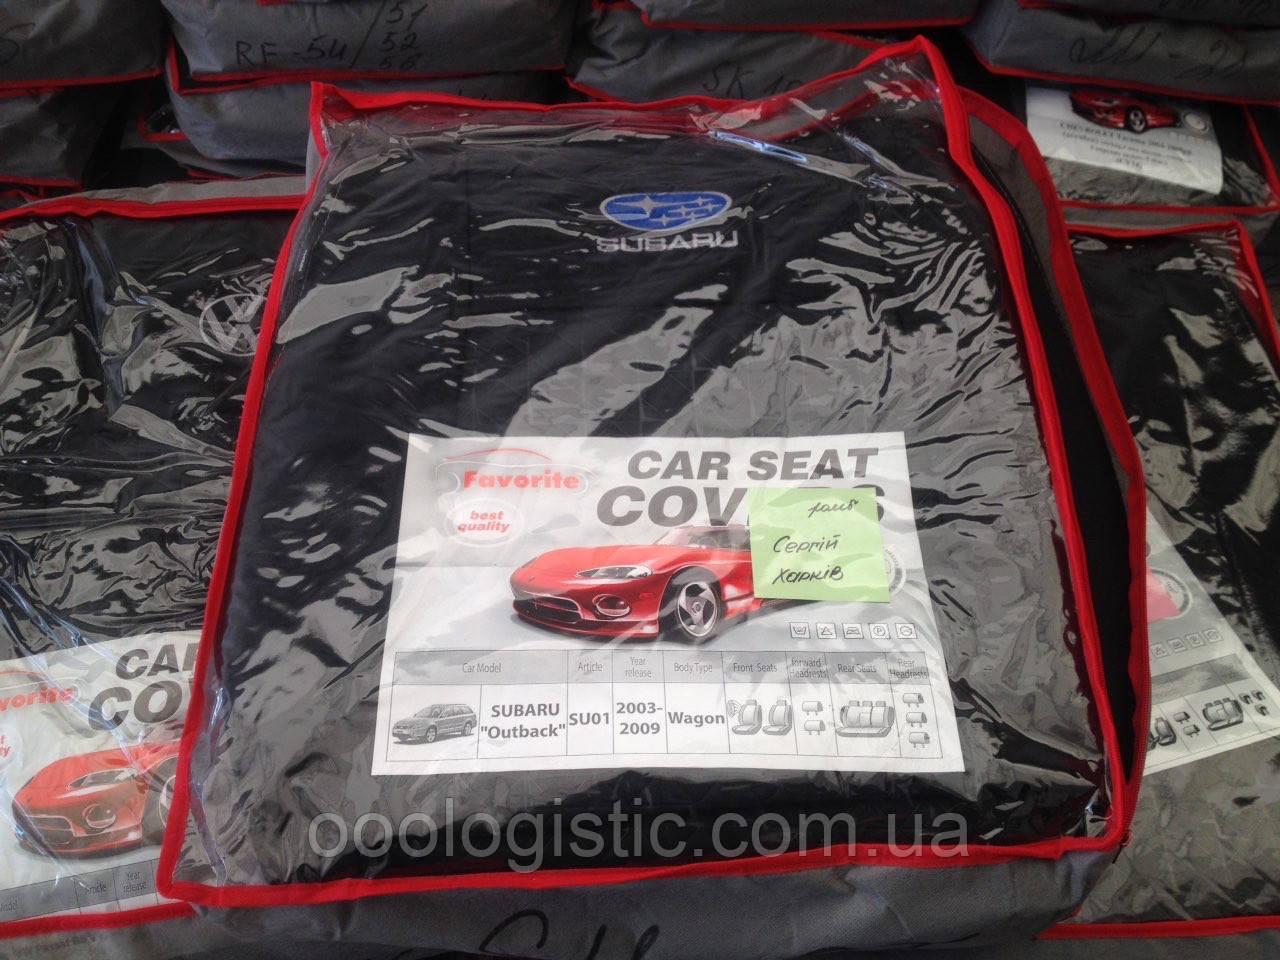 Авточохли Favorite на Subaru Outback 2003-2009 wagon , Субару Аутбек